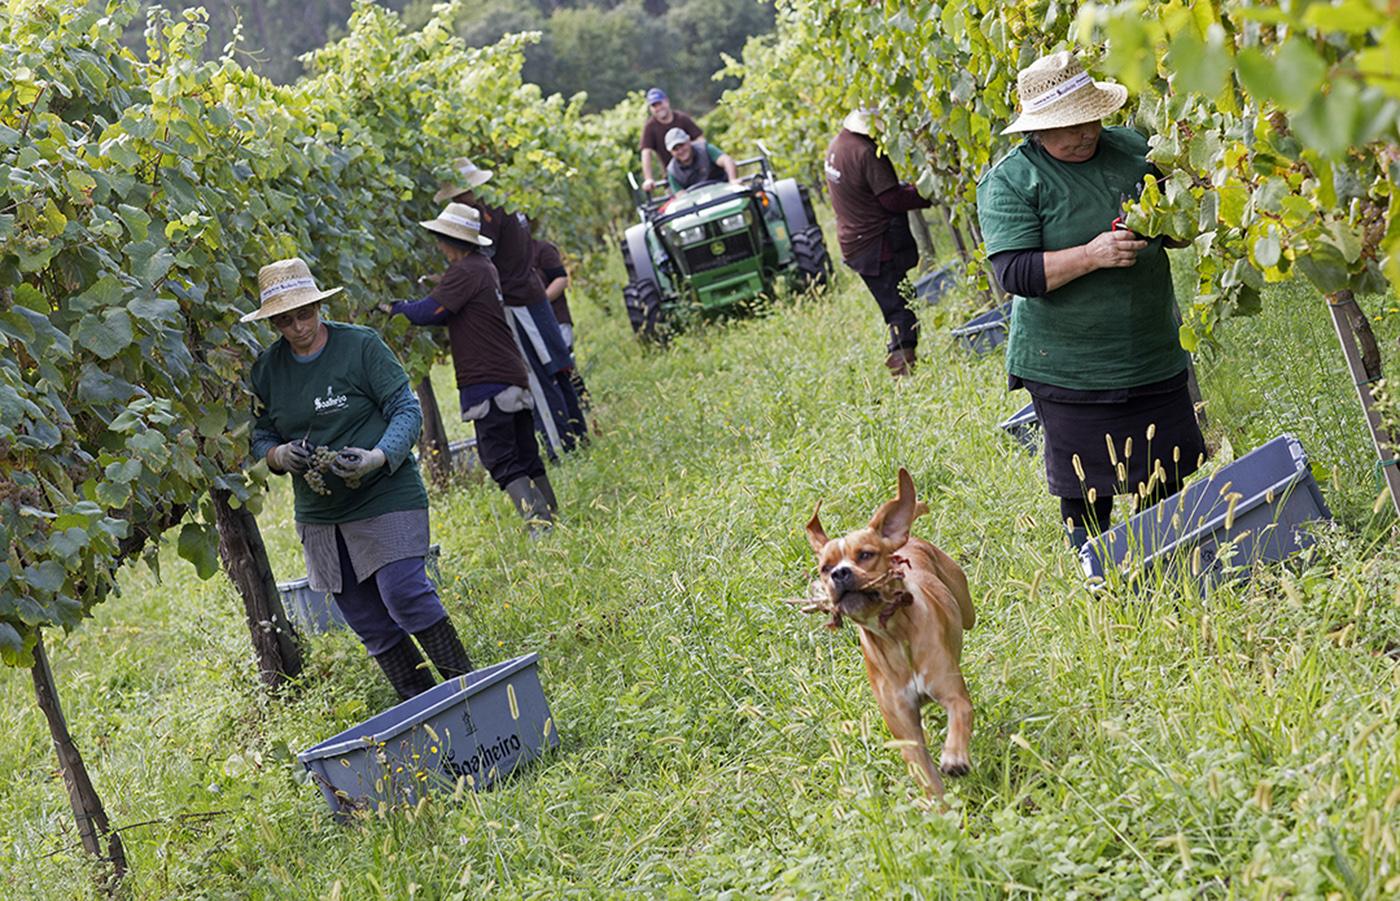 Experiências de vindimas no Adegga Harvest Weekend 2016